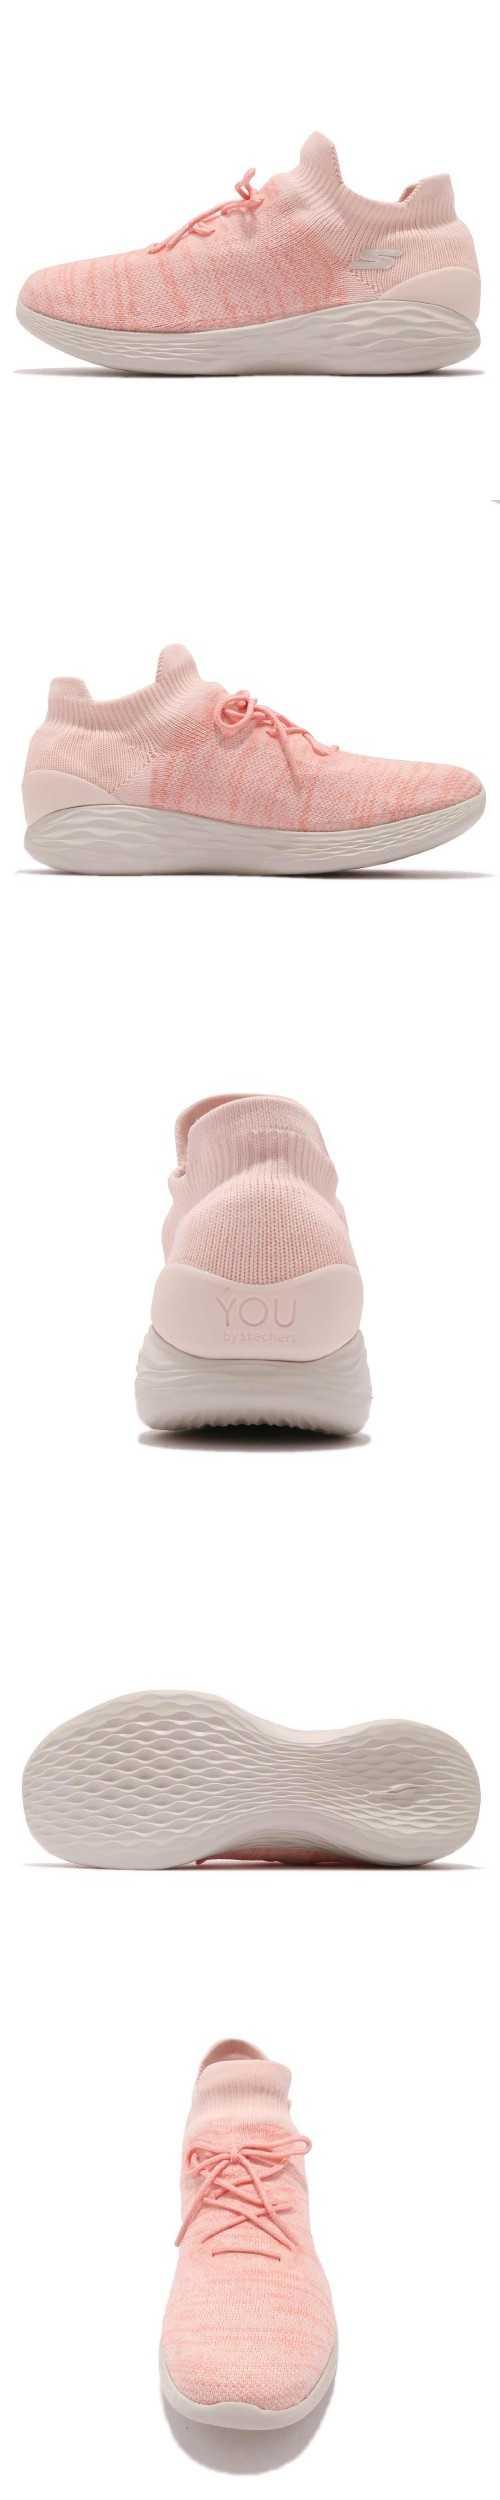 Skechers 健走鞋 You-Unique 運動 女鞋